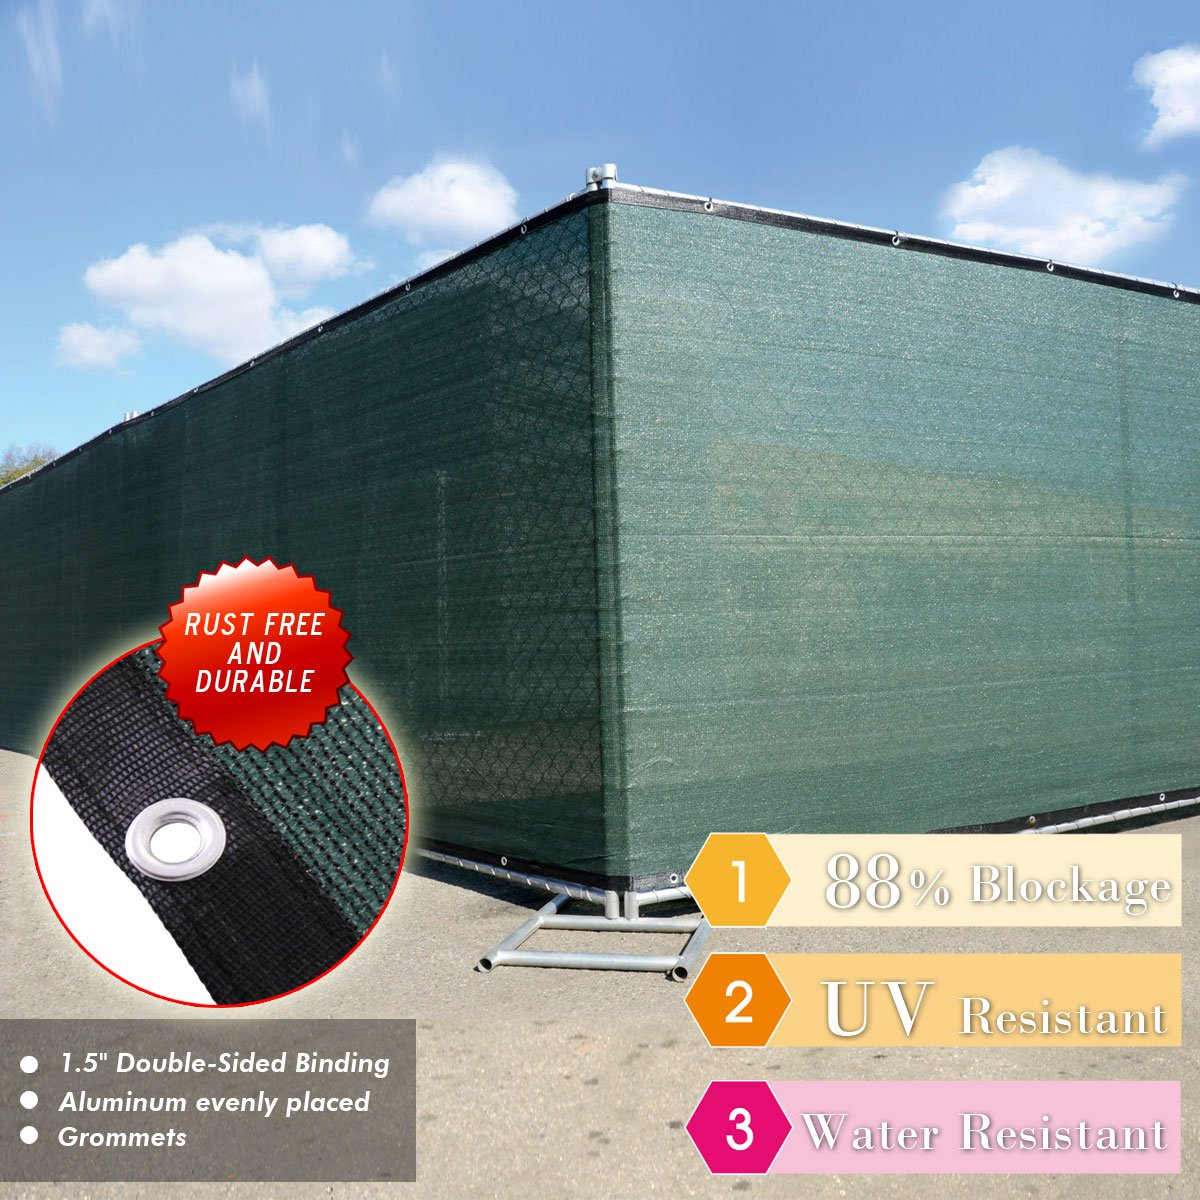 LAZYMOON Dark Green 4'x 50' Fabric Fence Windscreen Privacy Screen Shade Cover for Patio Garden Tarp